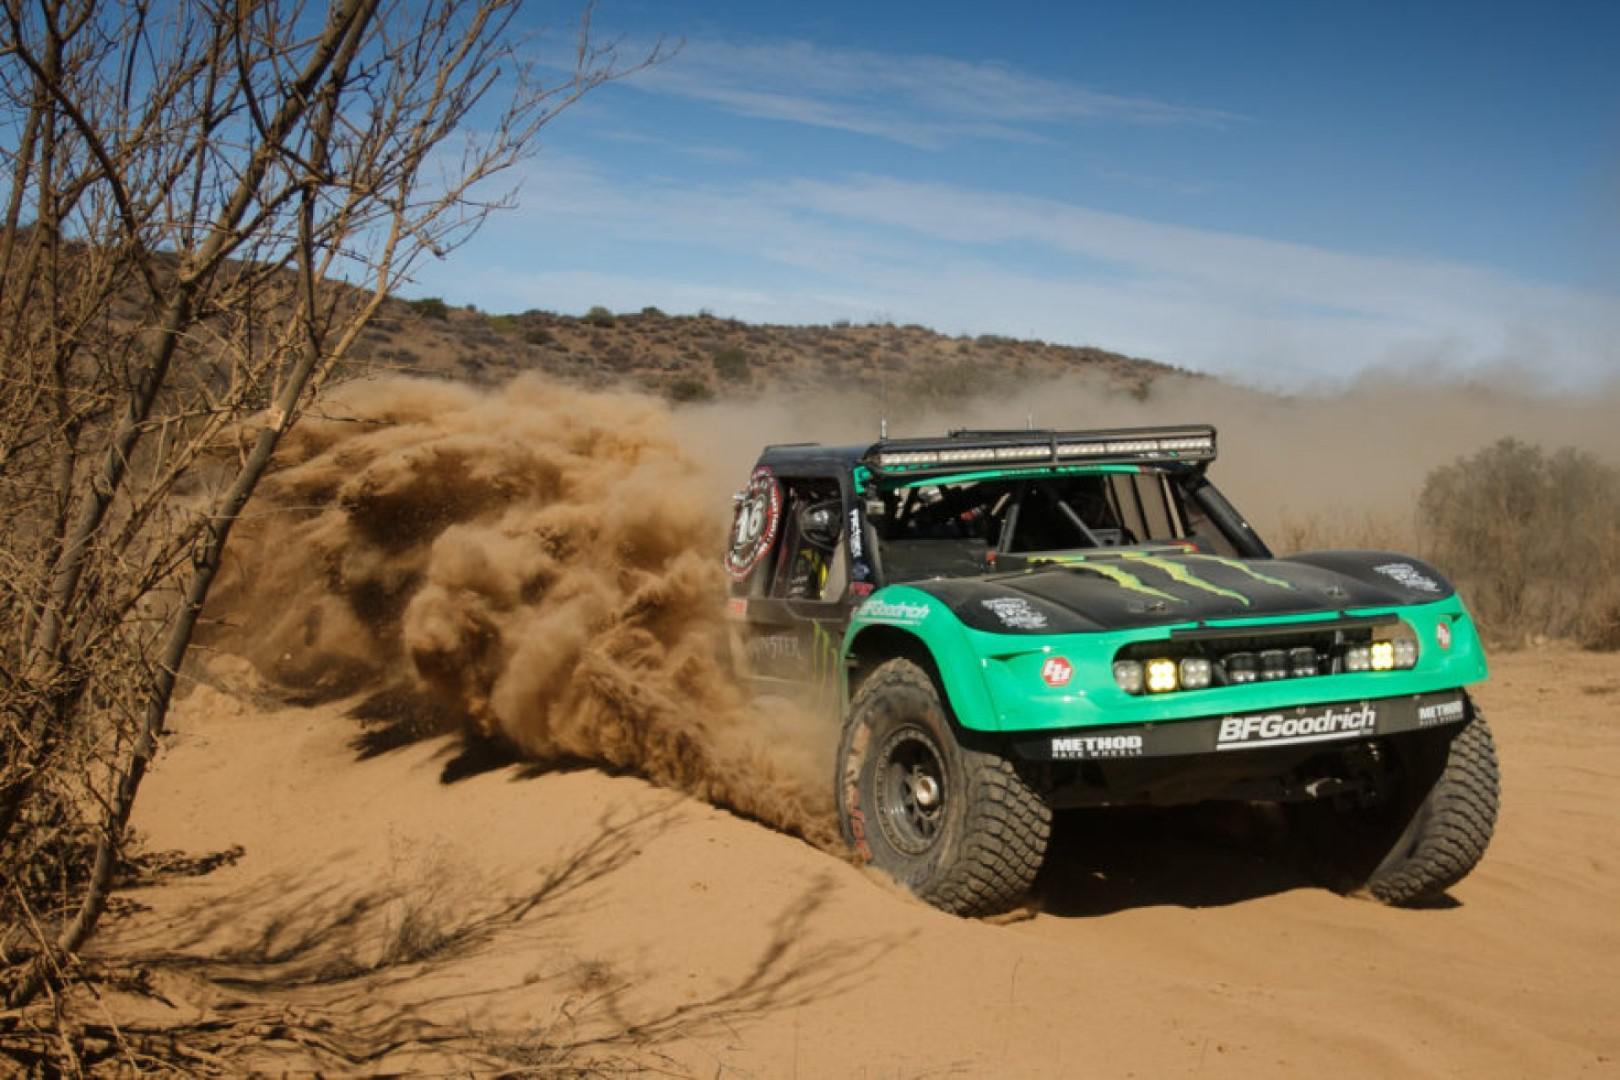 Cameron steele en trophy truck et justin morgan en moto remportent la 51 éme Baja 1000.